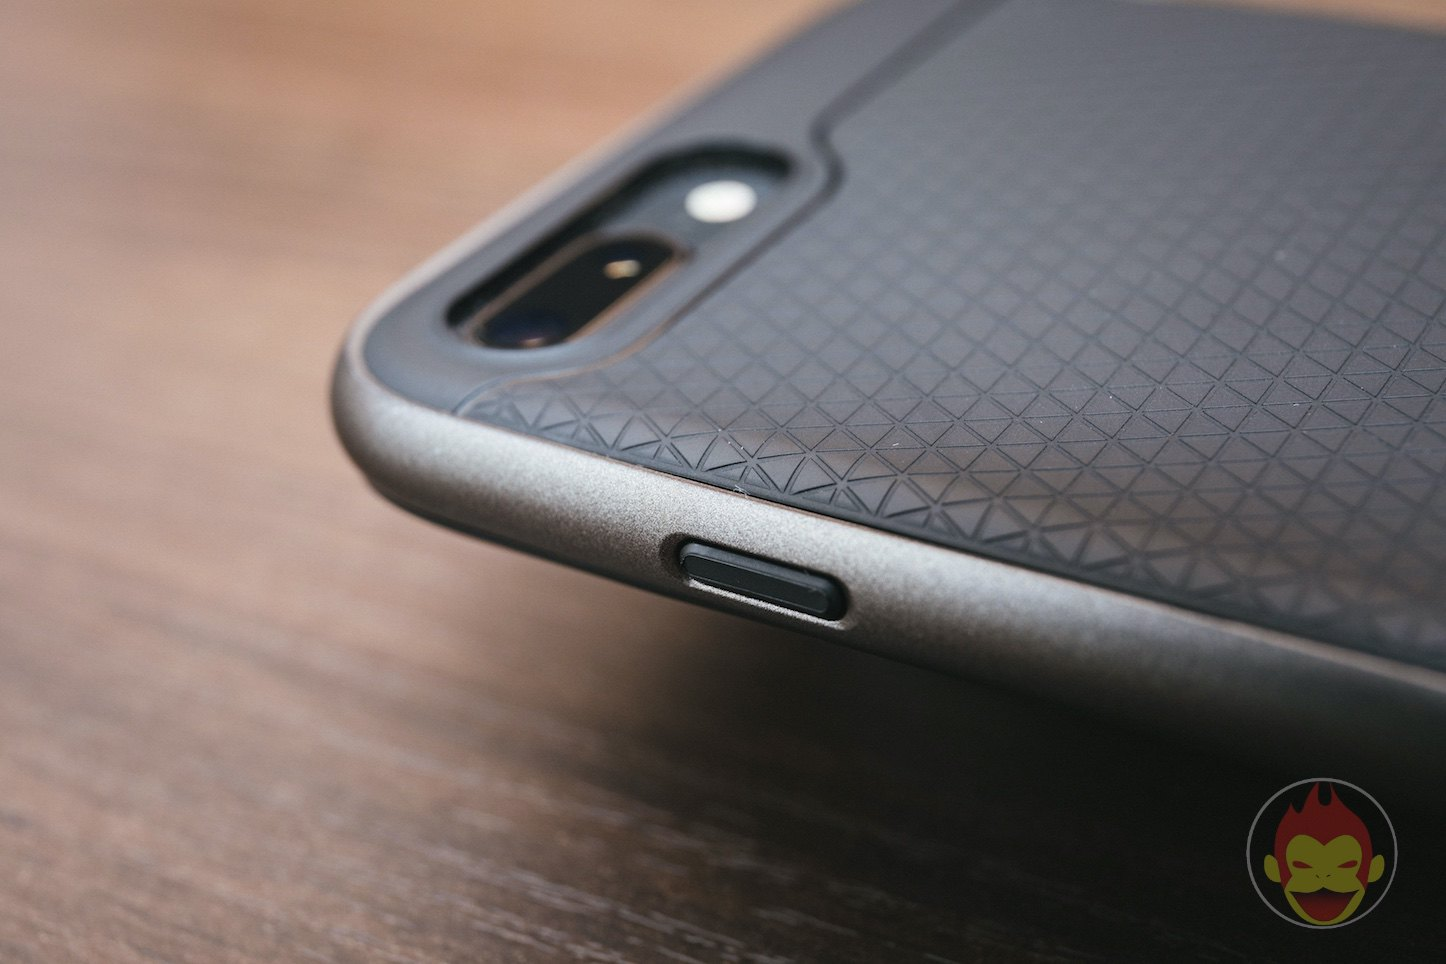 Spigen-Neo-Hybird-2-iPHone8Plus-Case-Review-02.jpg